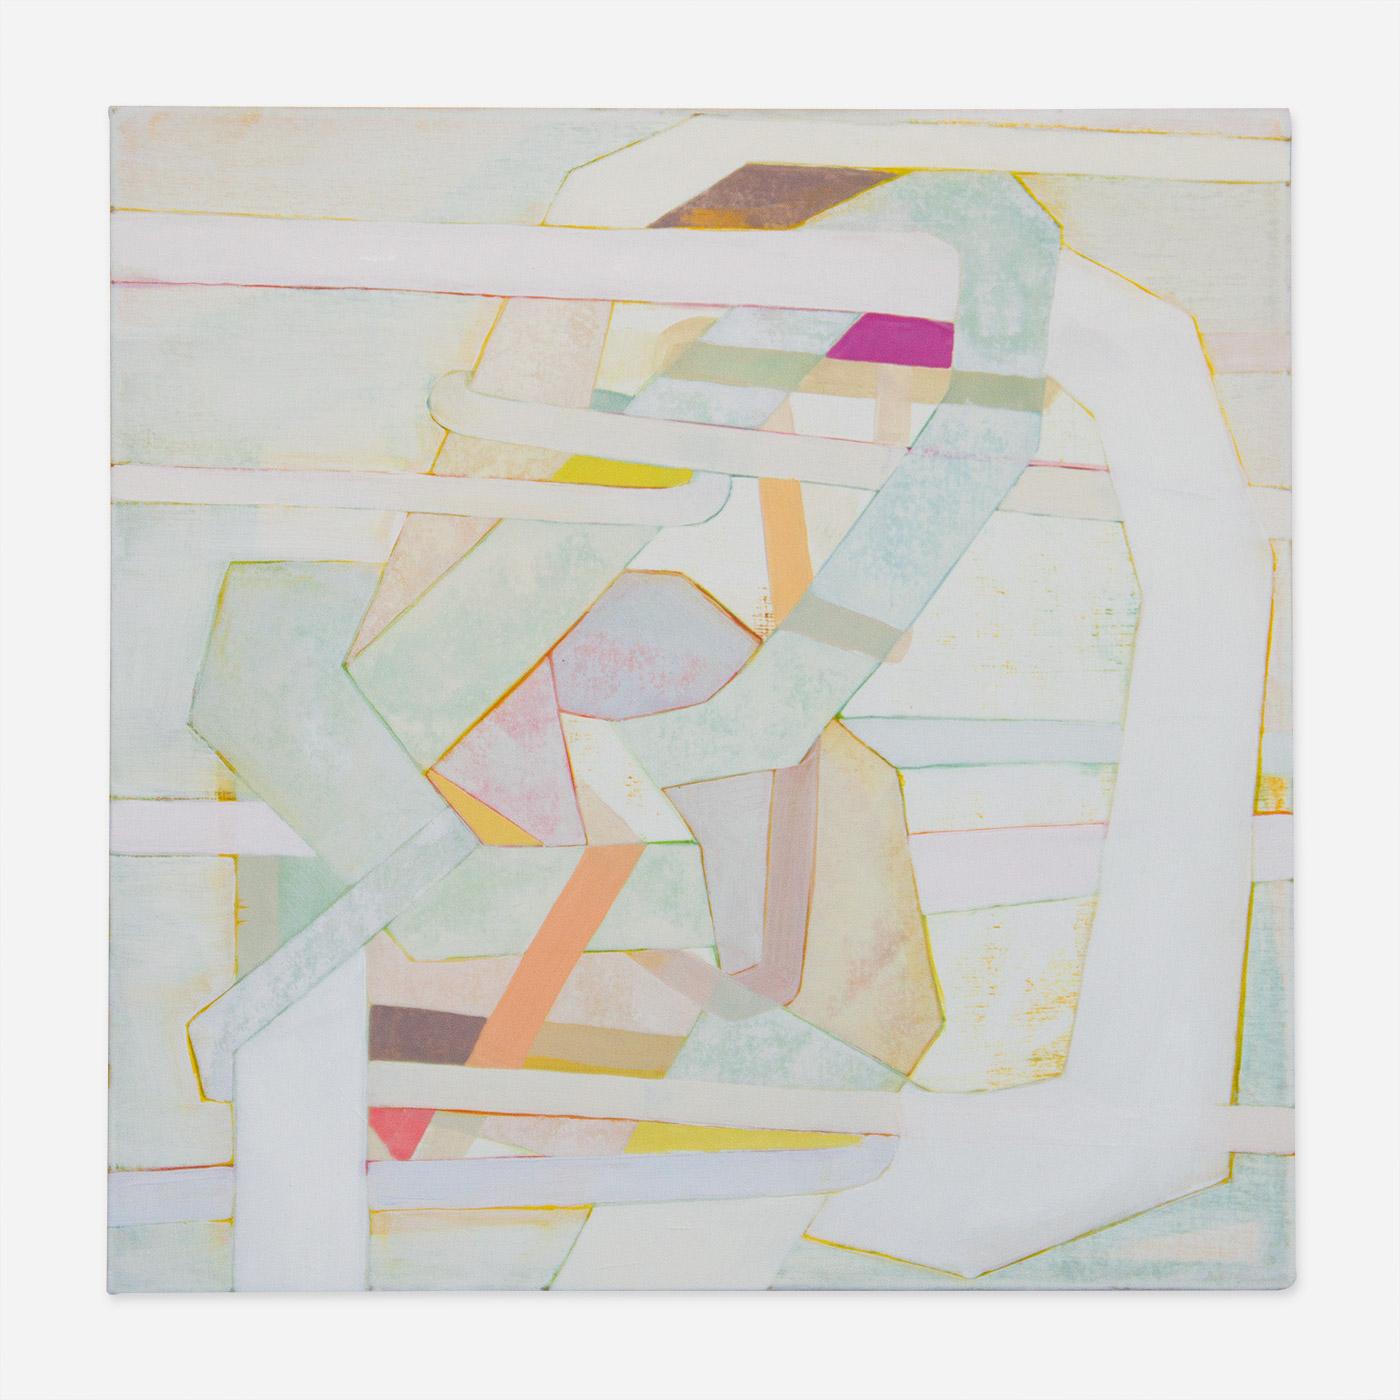 Entangled, 2012